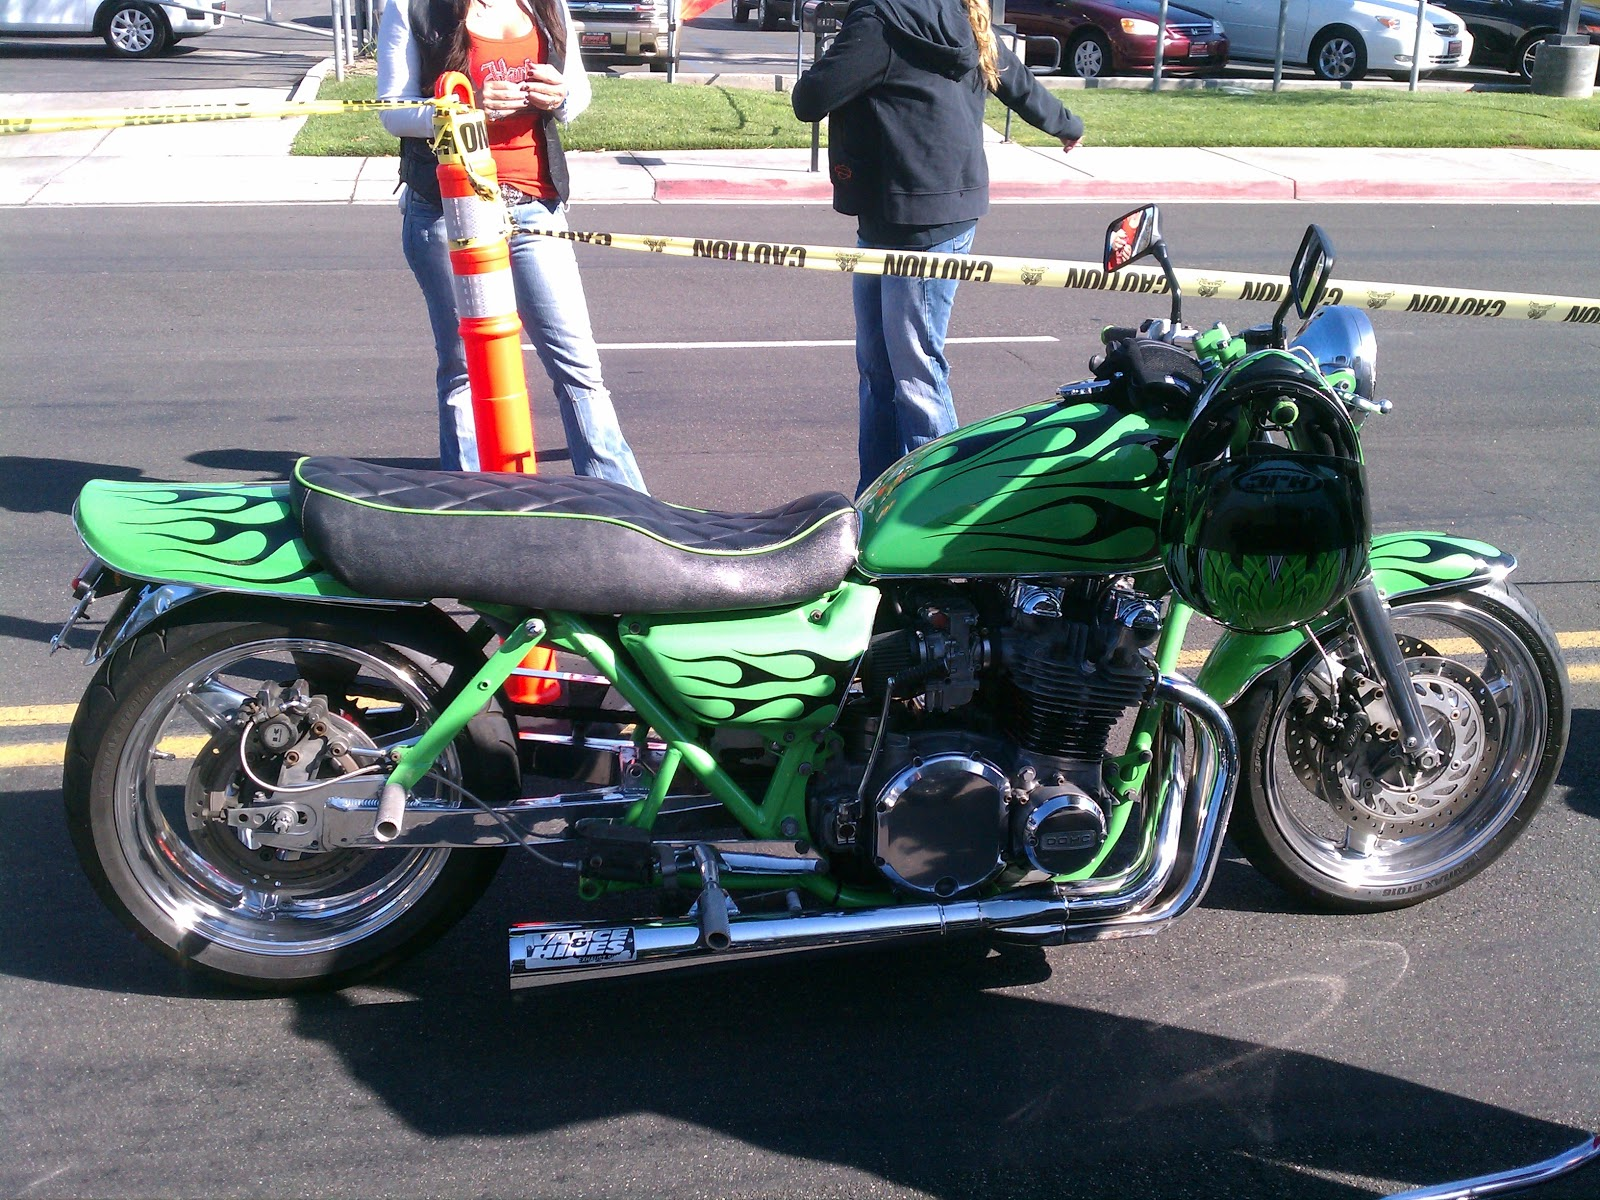 Weakened Warrior June 2011 : Kawasaki900DragBike from weakenedwarriorbiker.blogspot.com size 1600 x 1200 jpeg 537kB